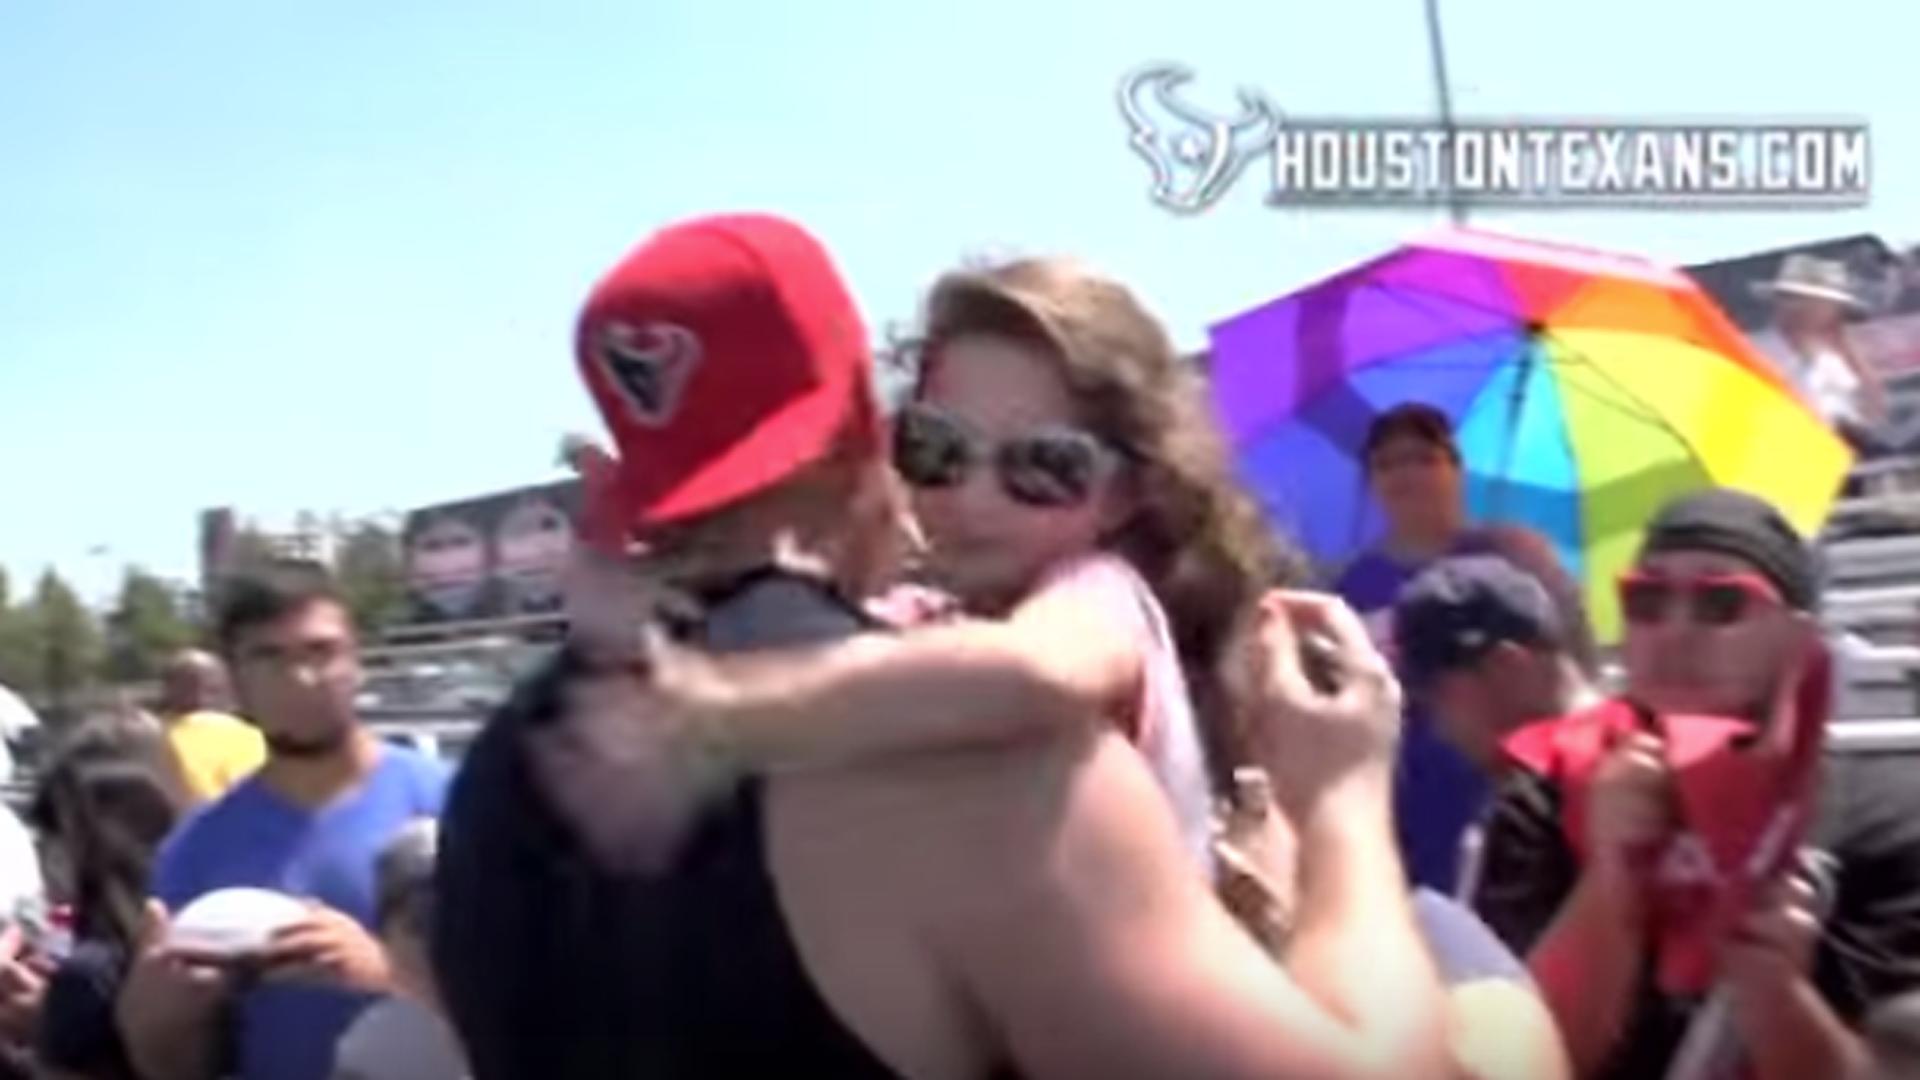 Adorable young Texans' fan hugs, kisses J.J. Watt